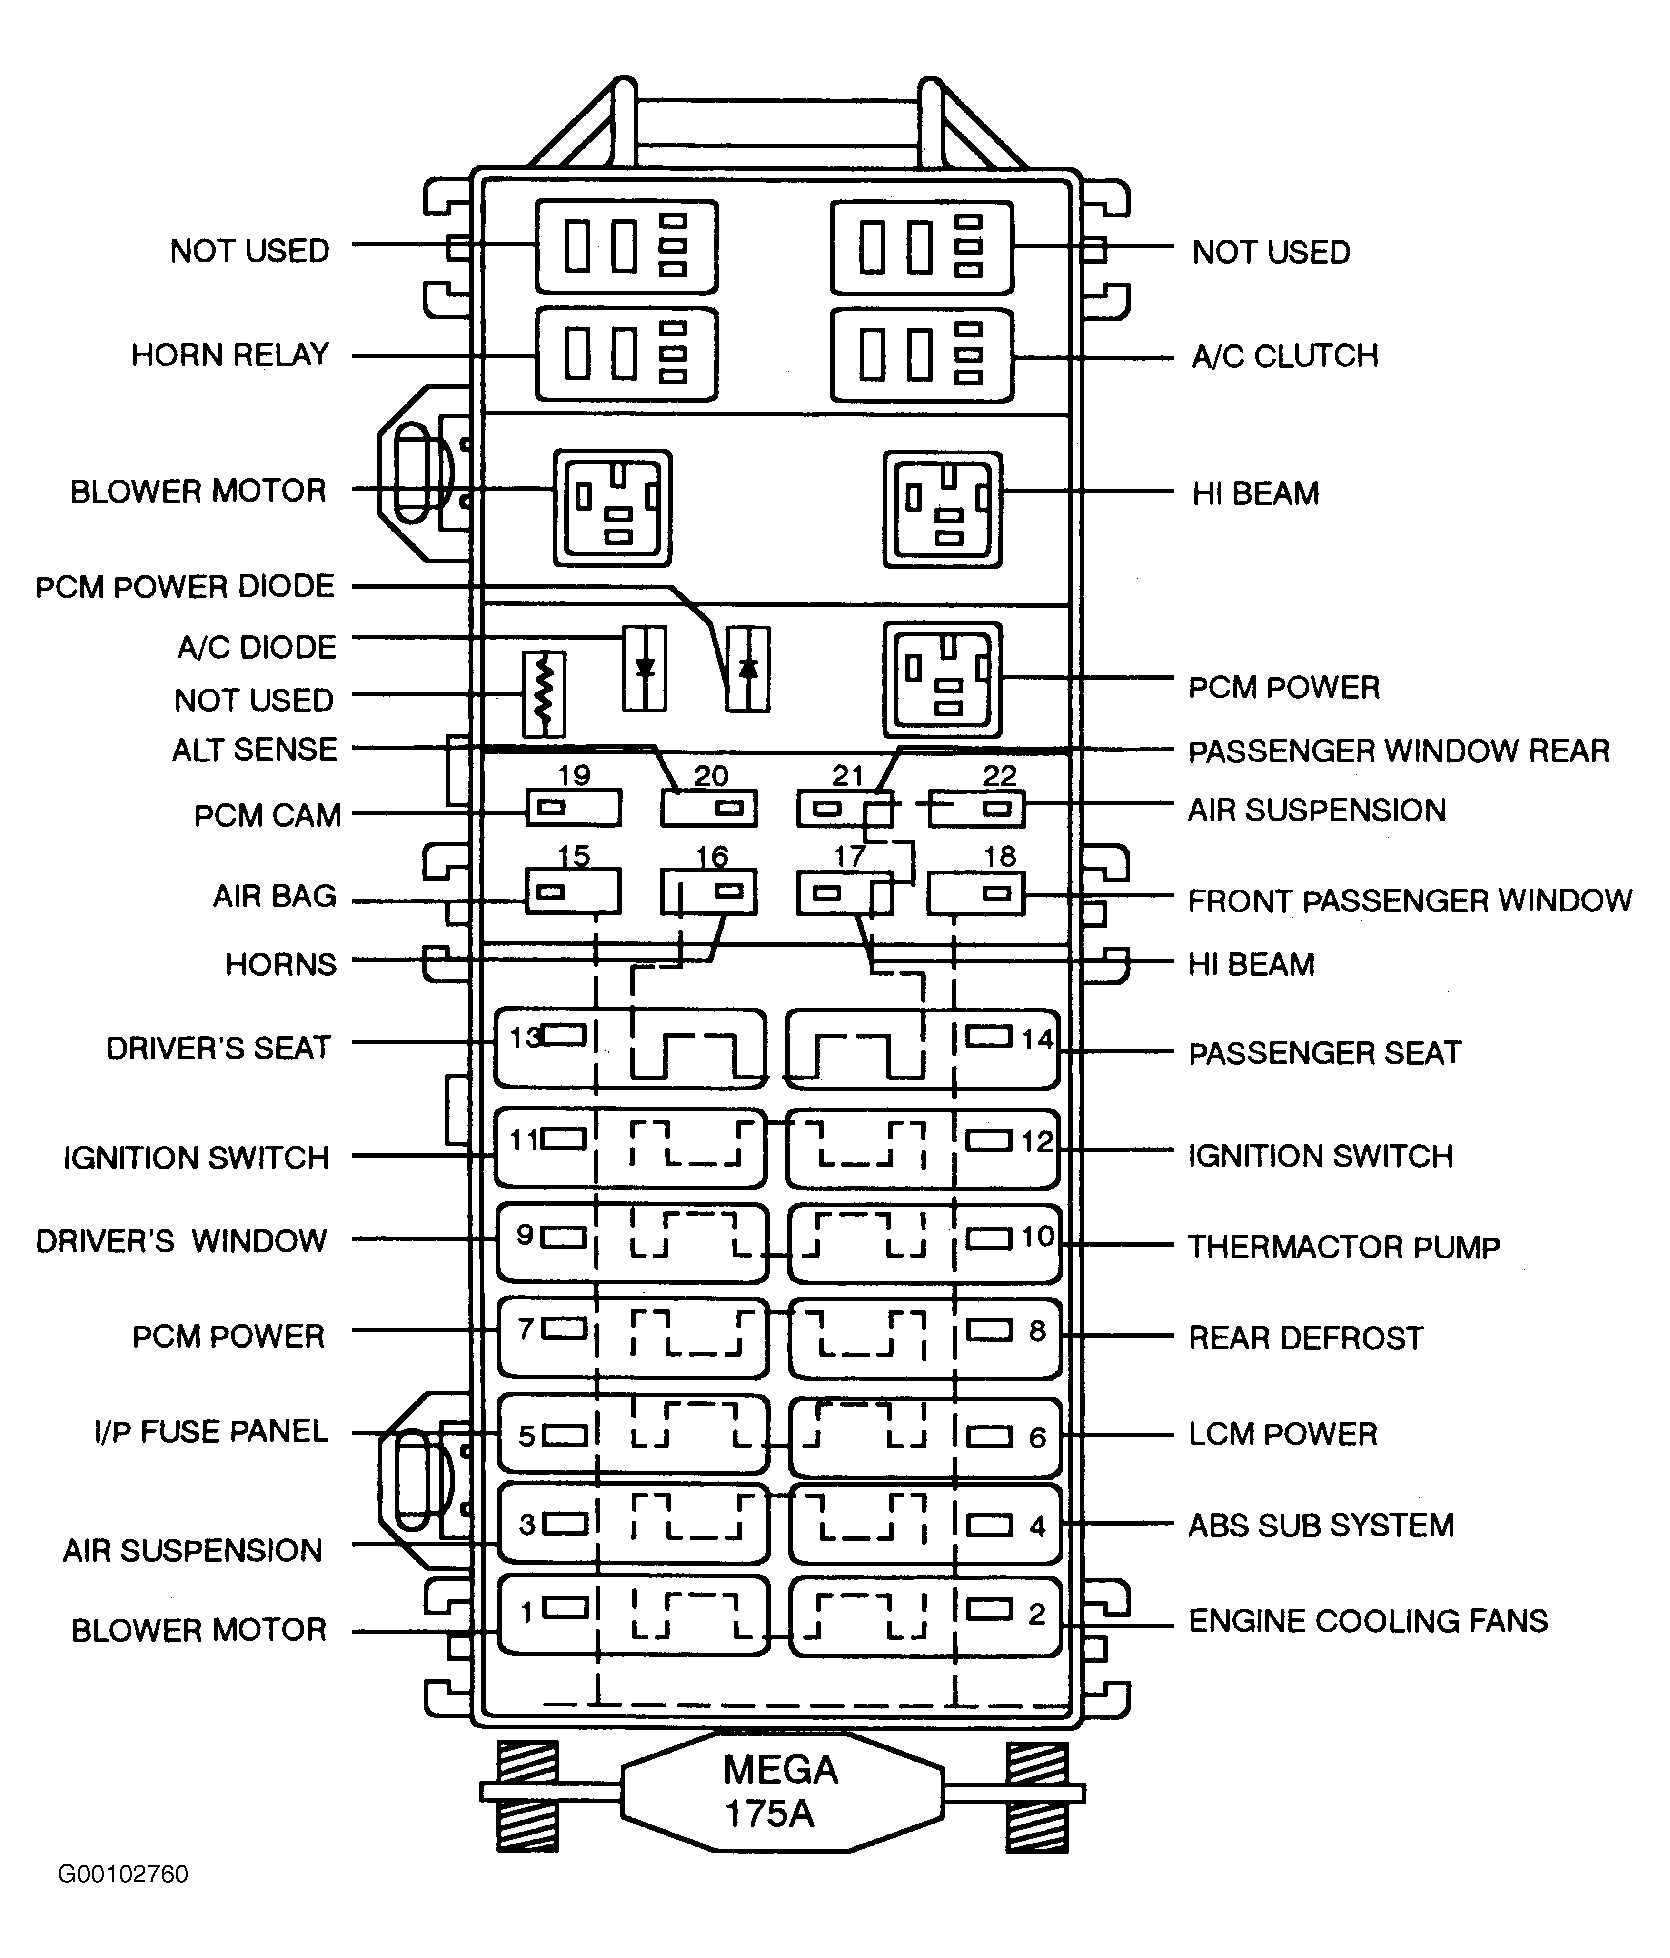 Automotive Fuse Box Uk Wiring Library Two Wire Alternator Diagram For Sba185046320 91 Town Car Simple Rh David Huggett Co